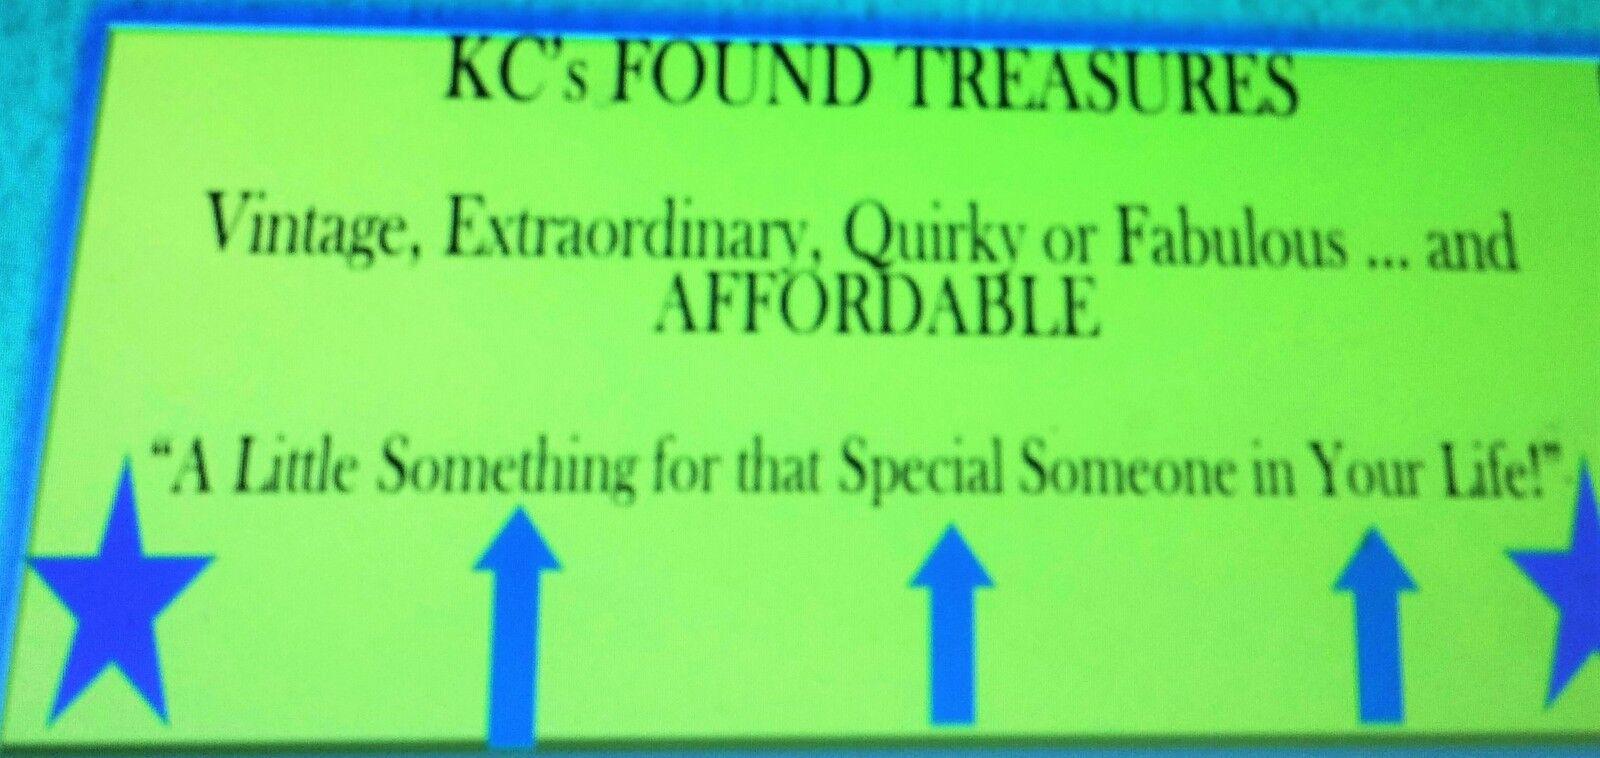 KCsFoundTreasures